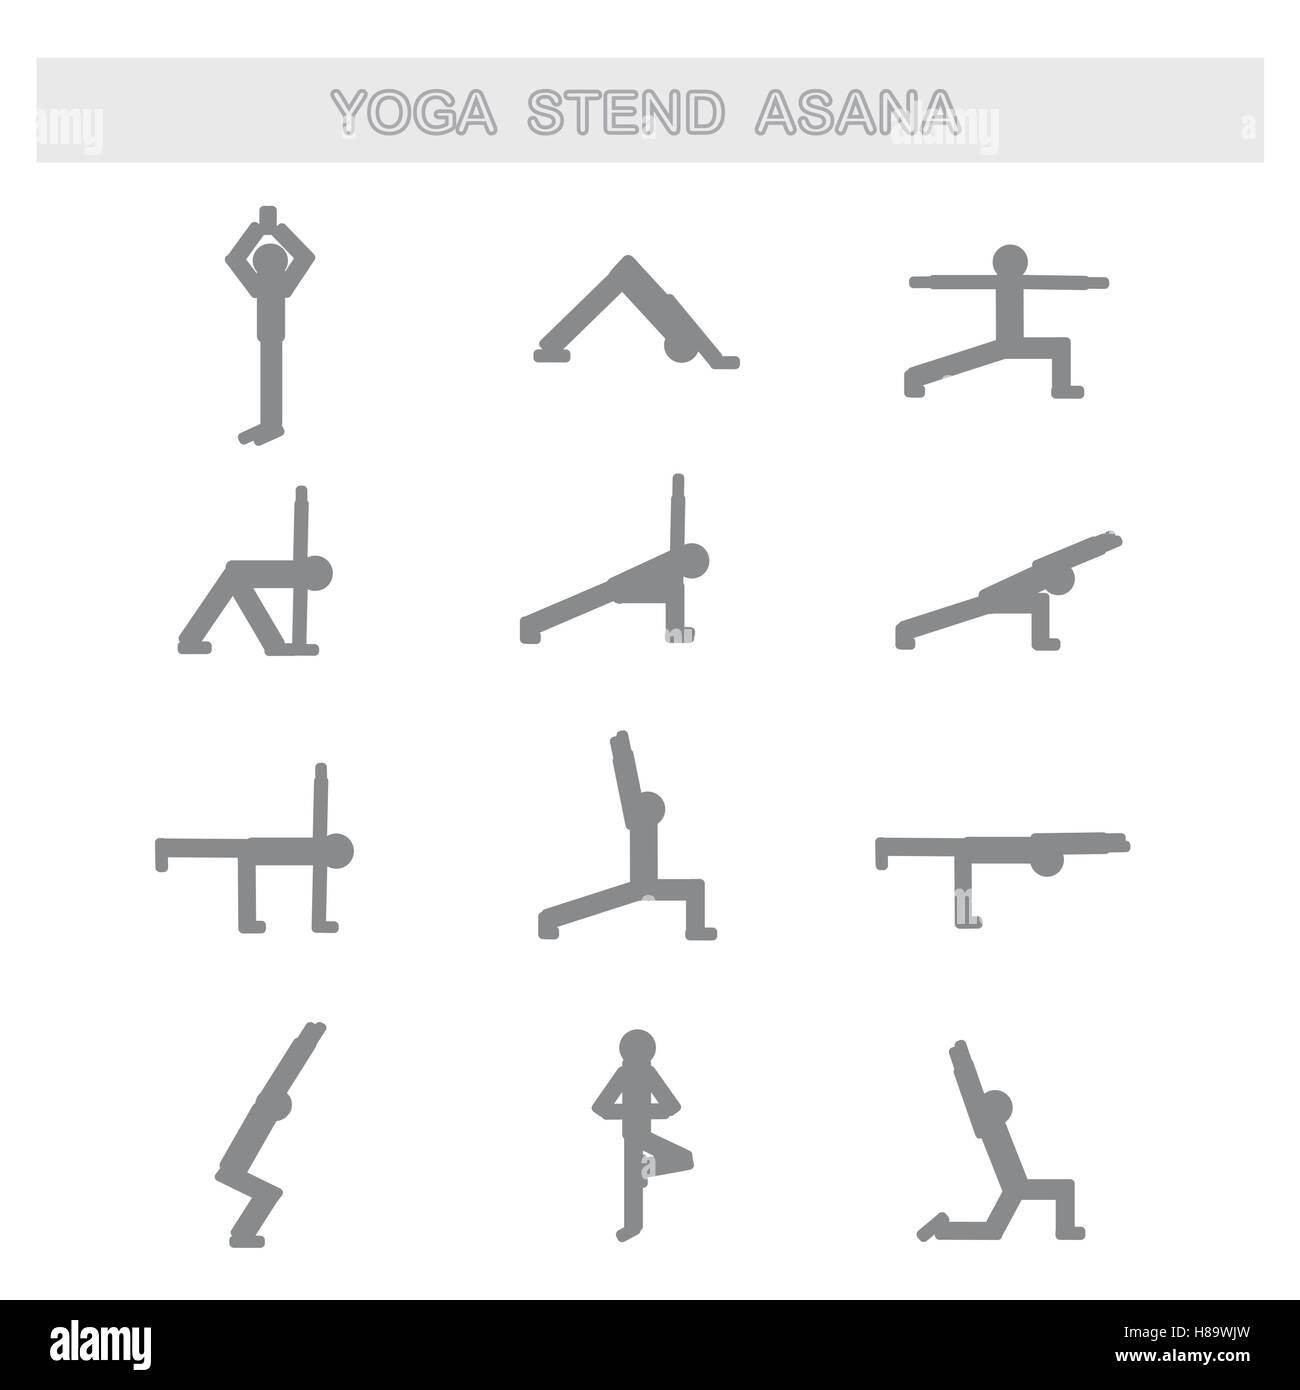 Set of icons. Poses yoga asanas. - Stock Vector